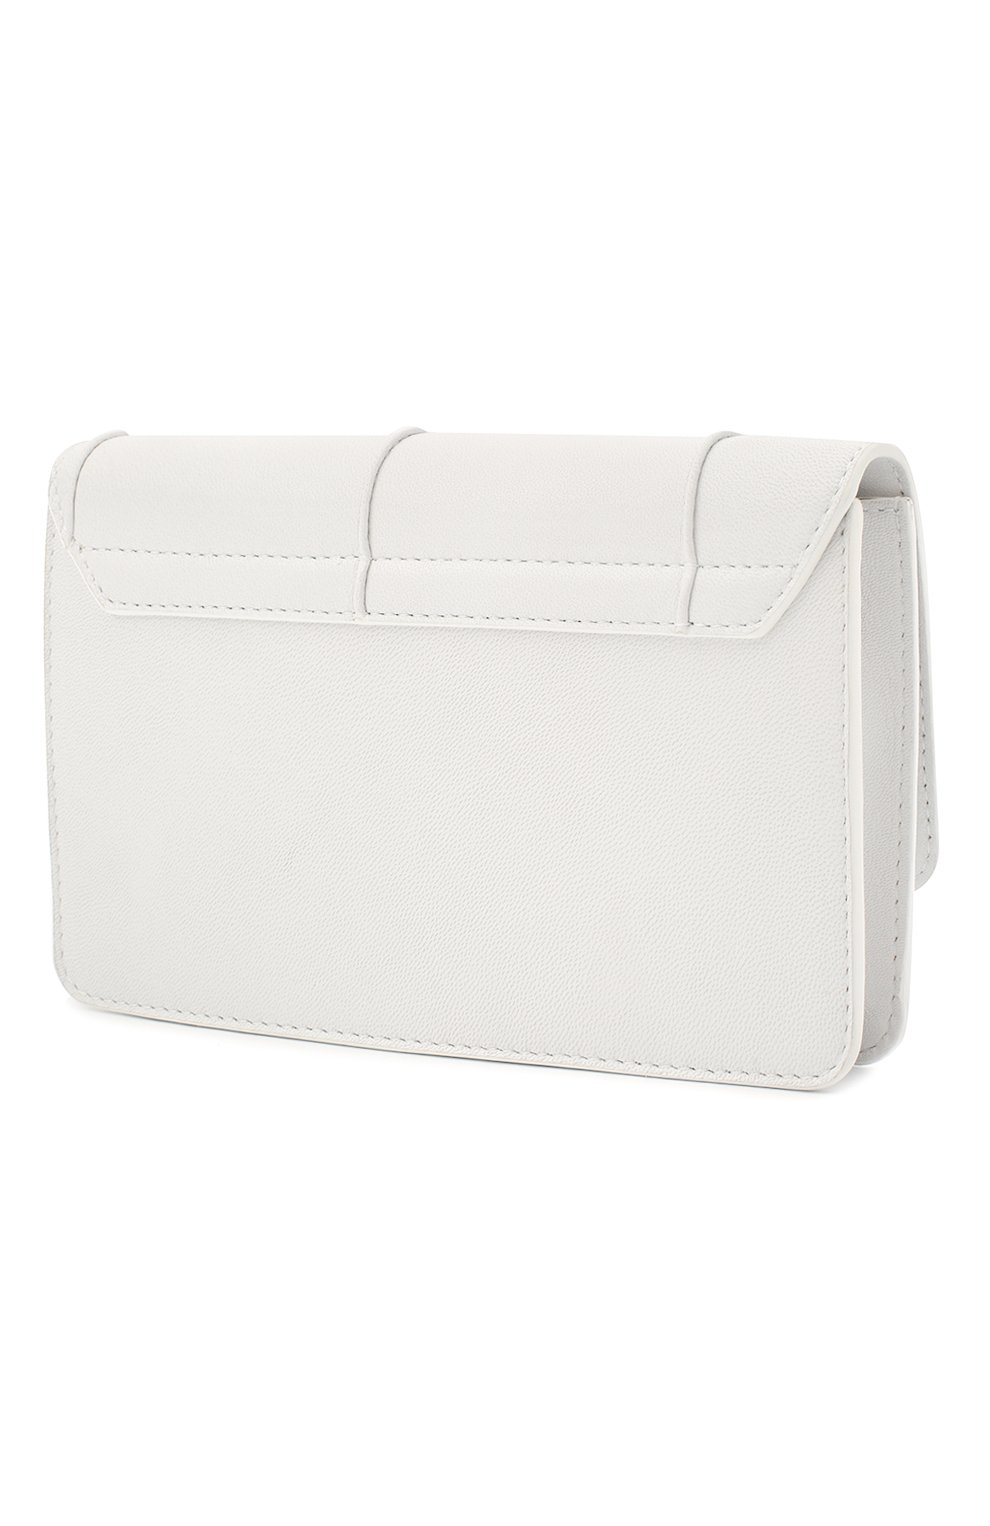 Женская сумка le riviera mini JACQUEMUS белого цвета, арт. 203BA09/308100 | Фото 4